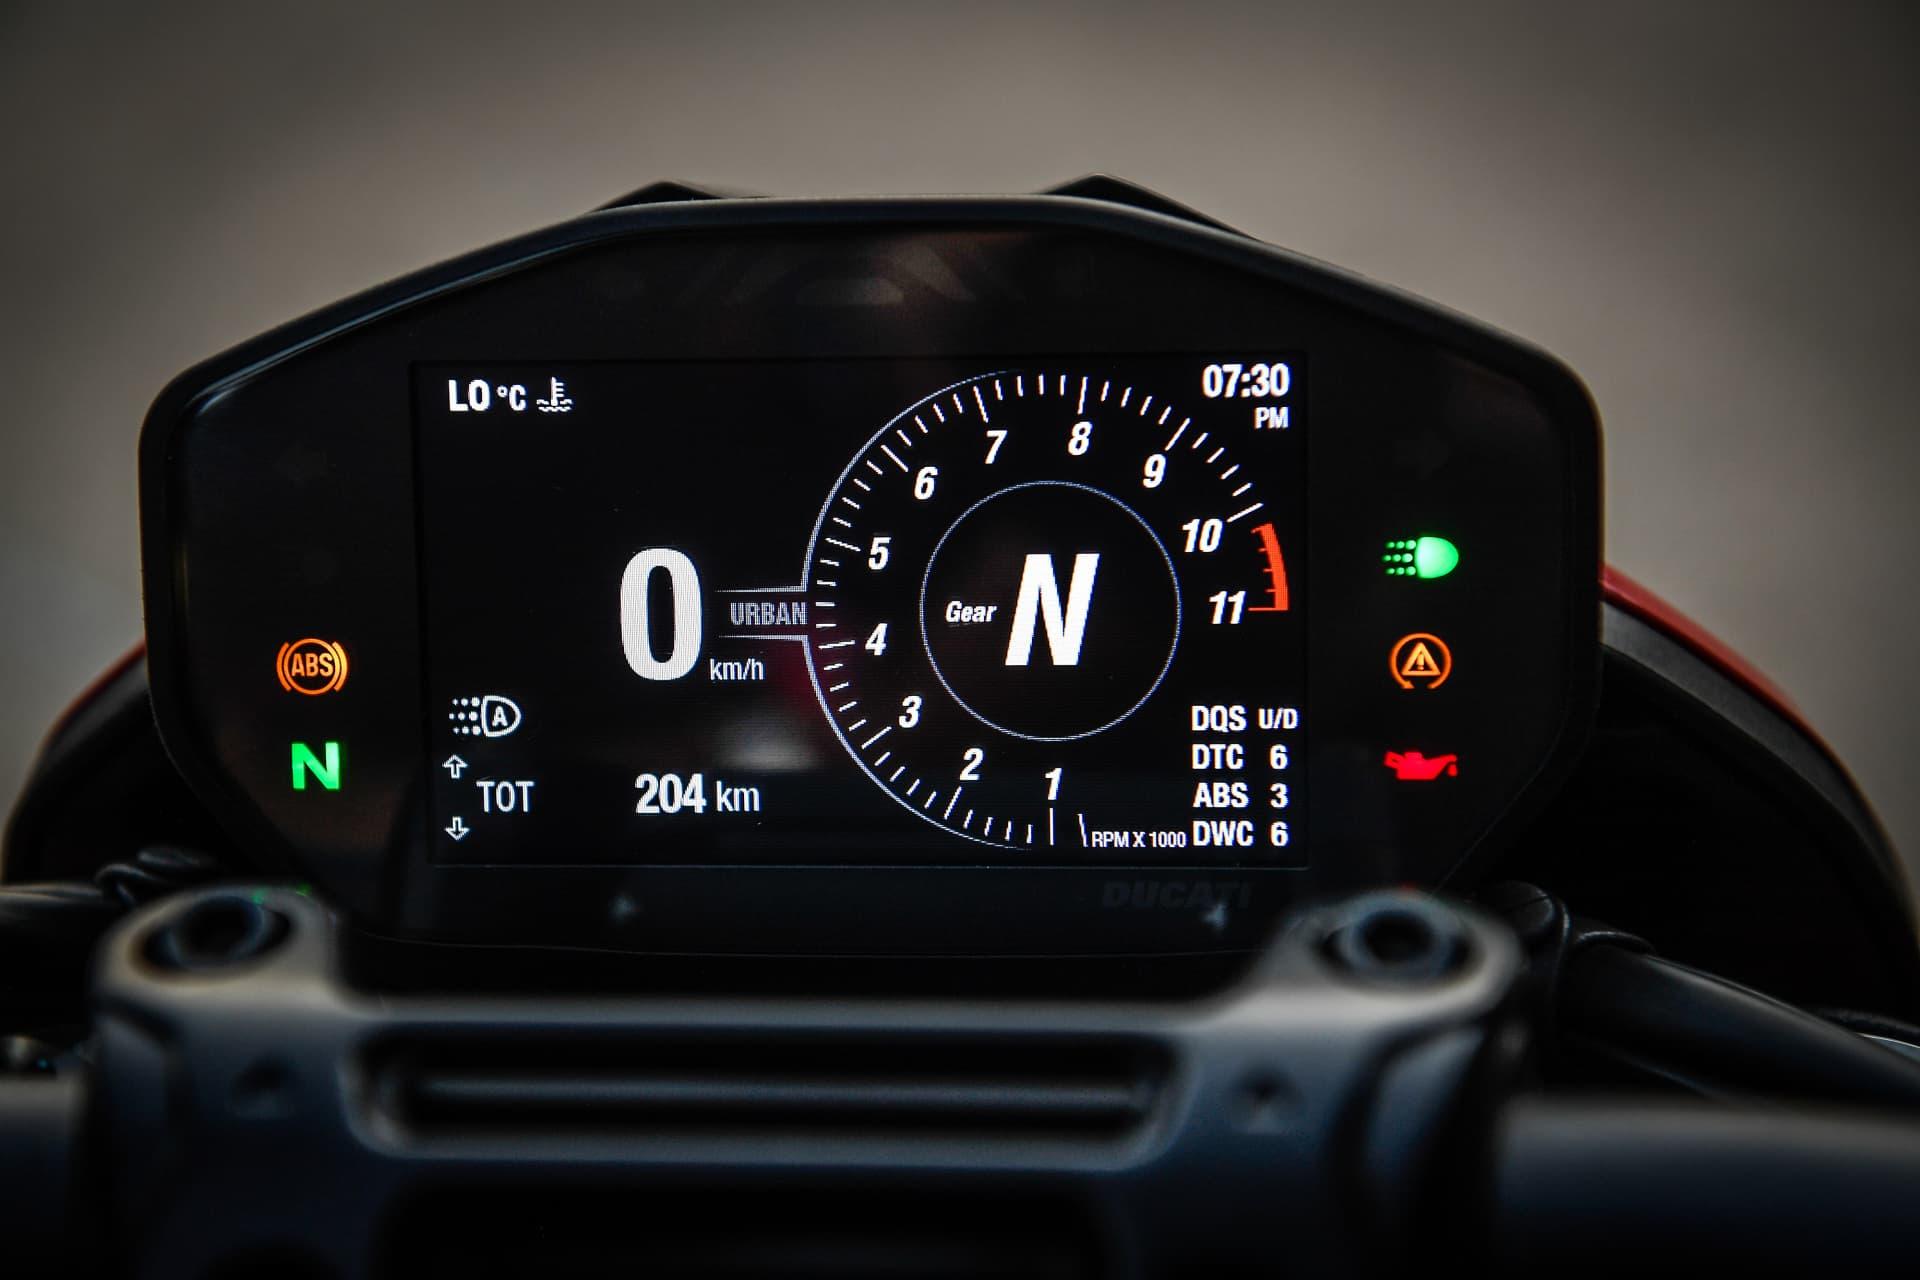 Ducati Hypermotard 950 Sp Static 21 Uc70320 Mid